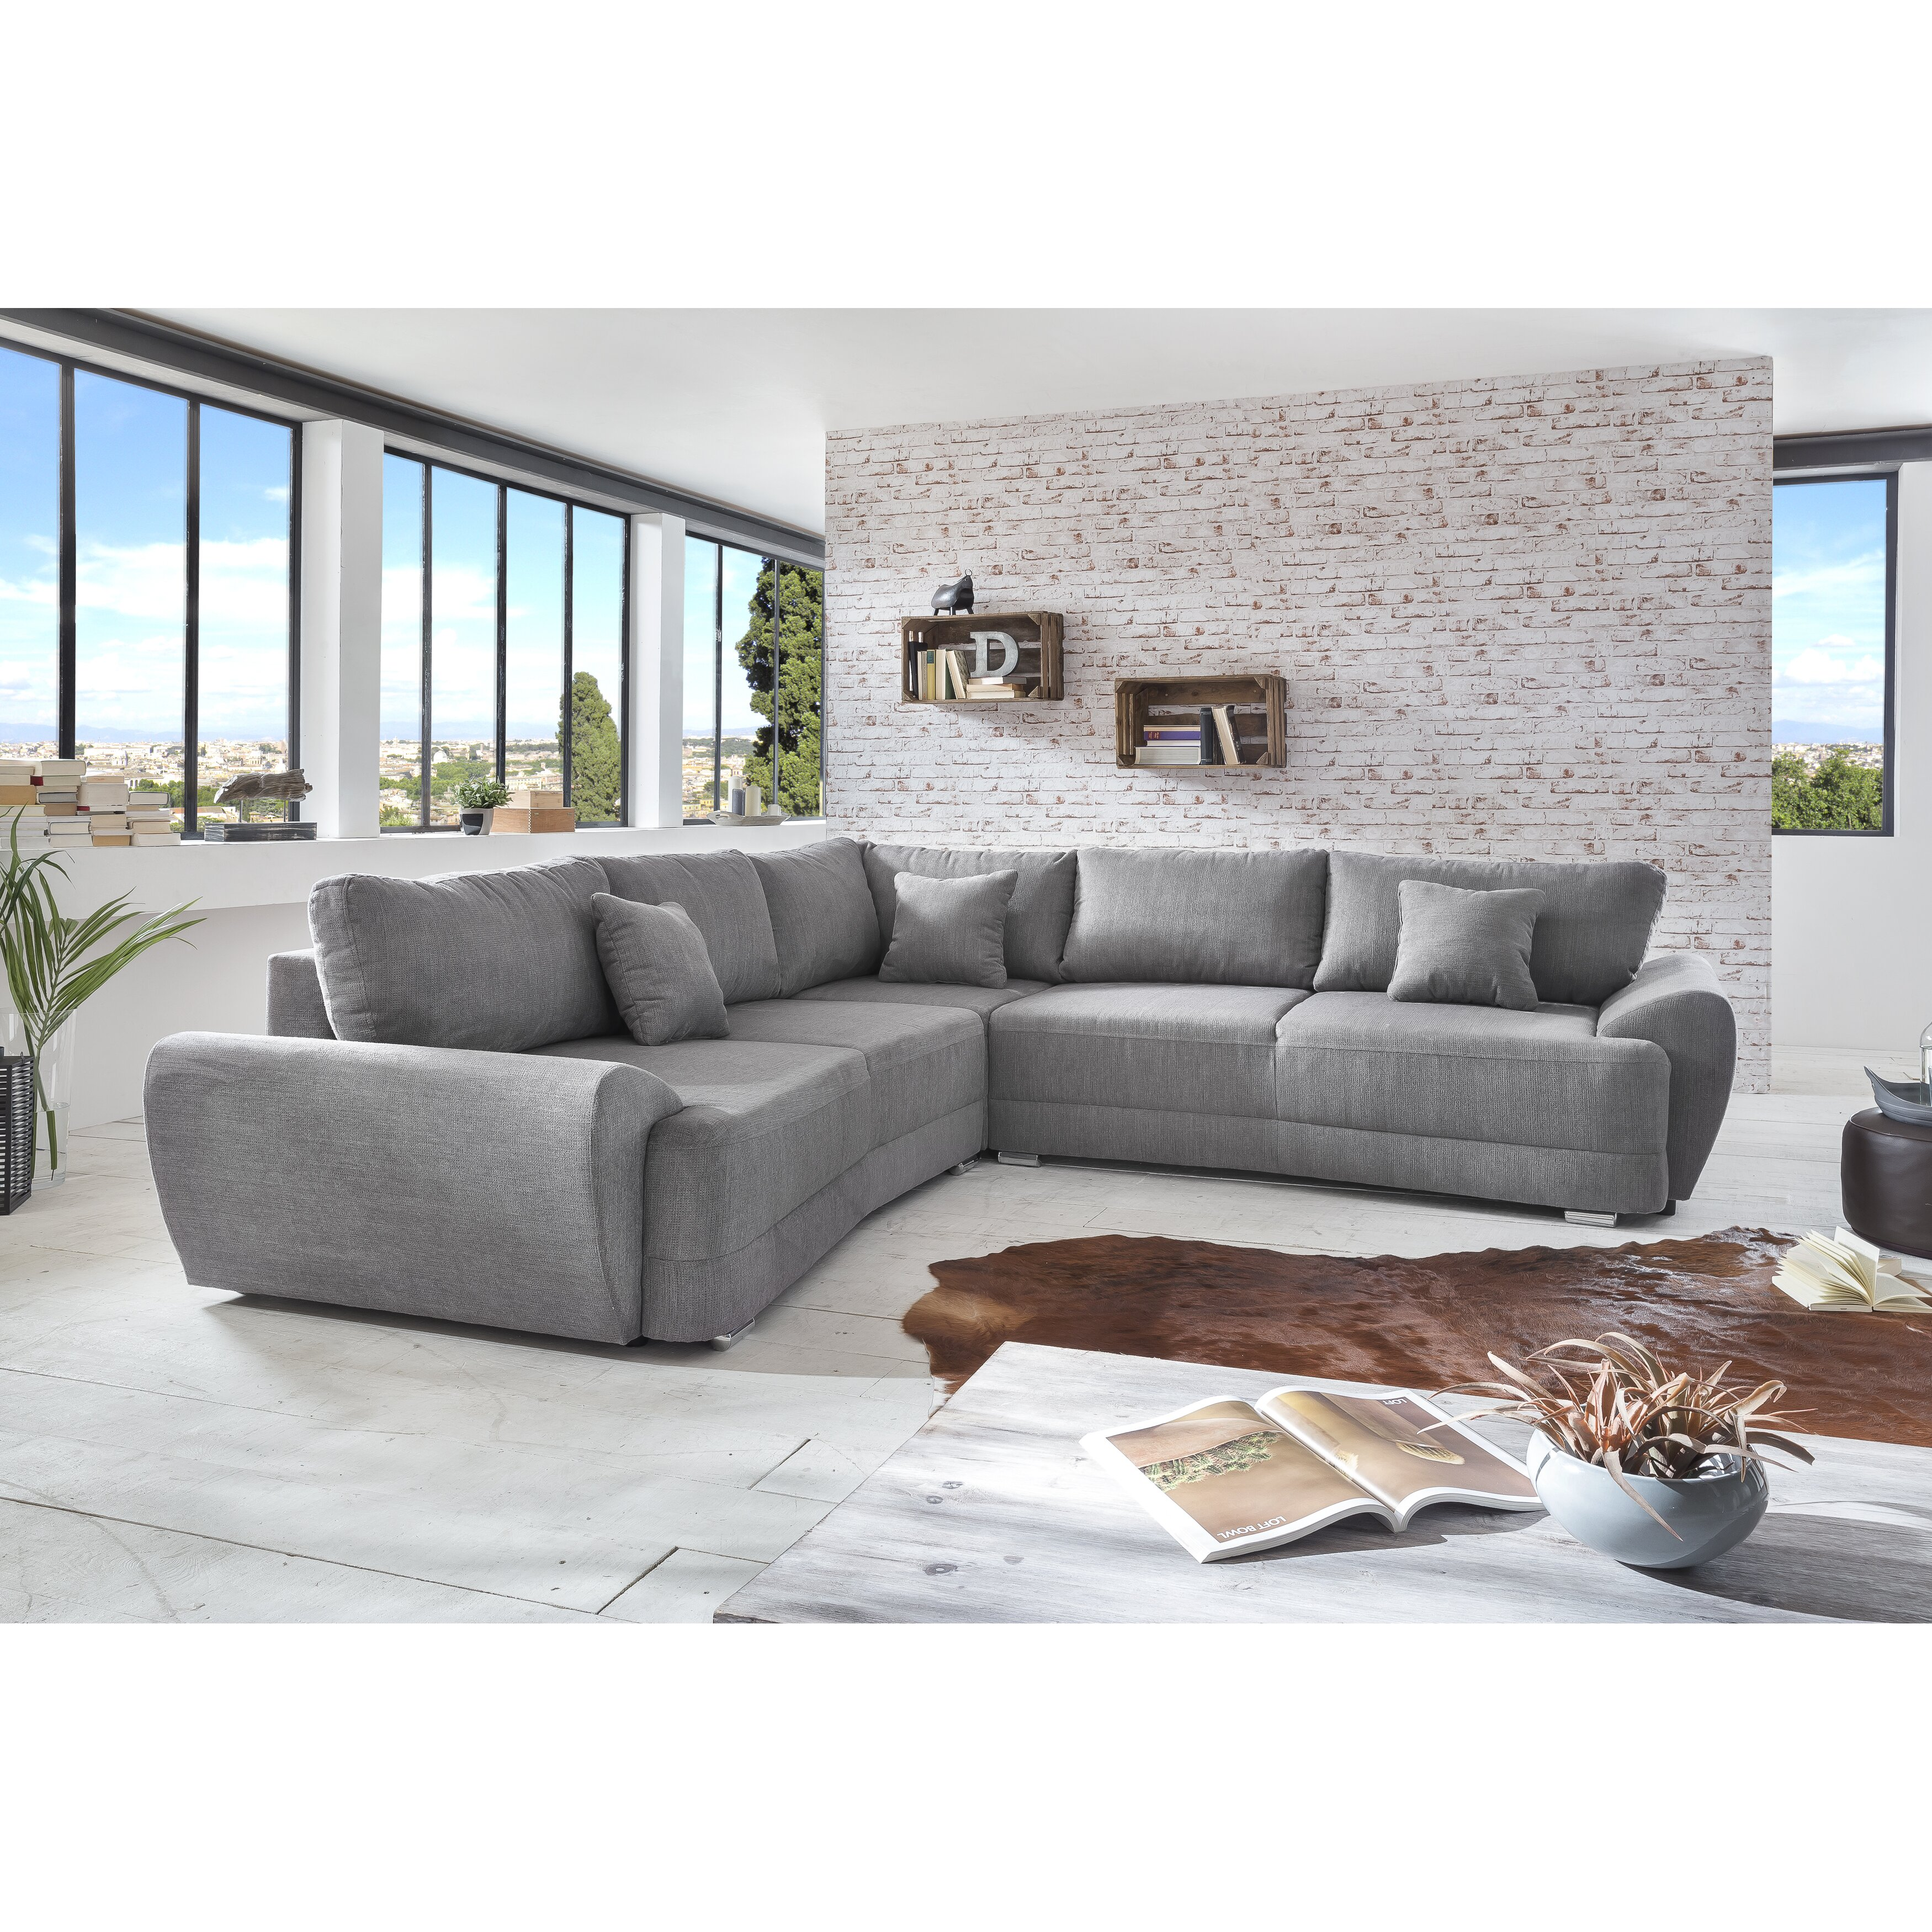 benformato ecksofa basso mit bettfunktion. Black Bedroom Furniture Sets. Home Design Ideas